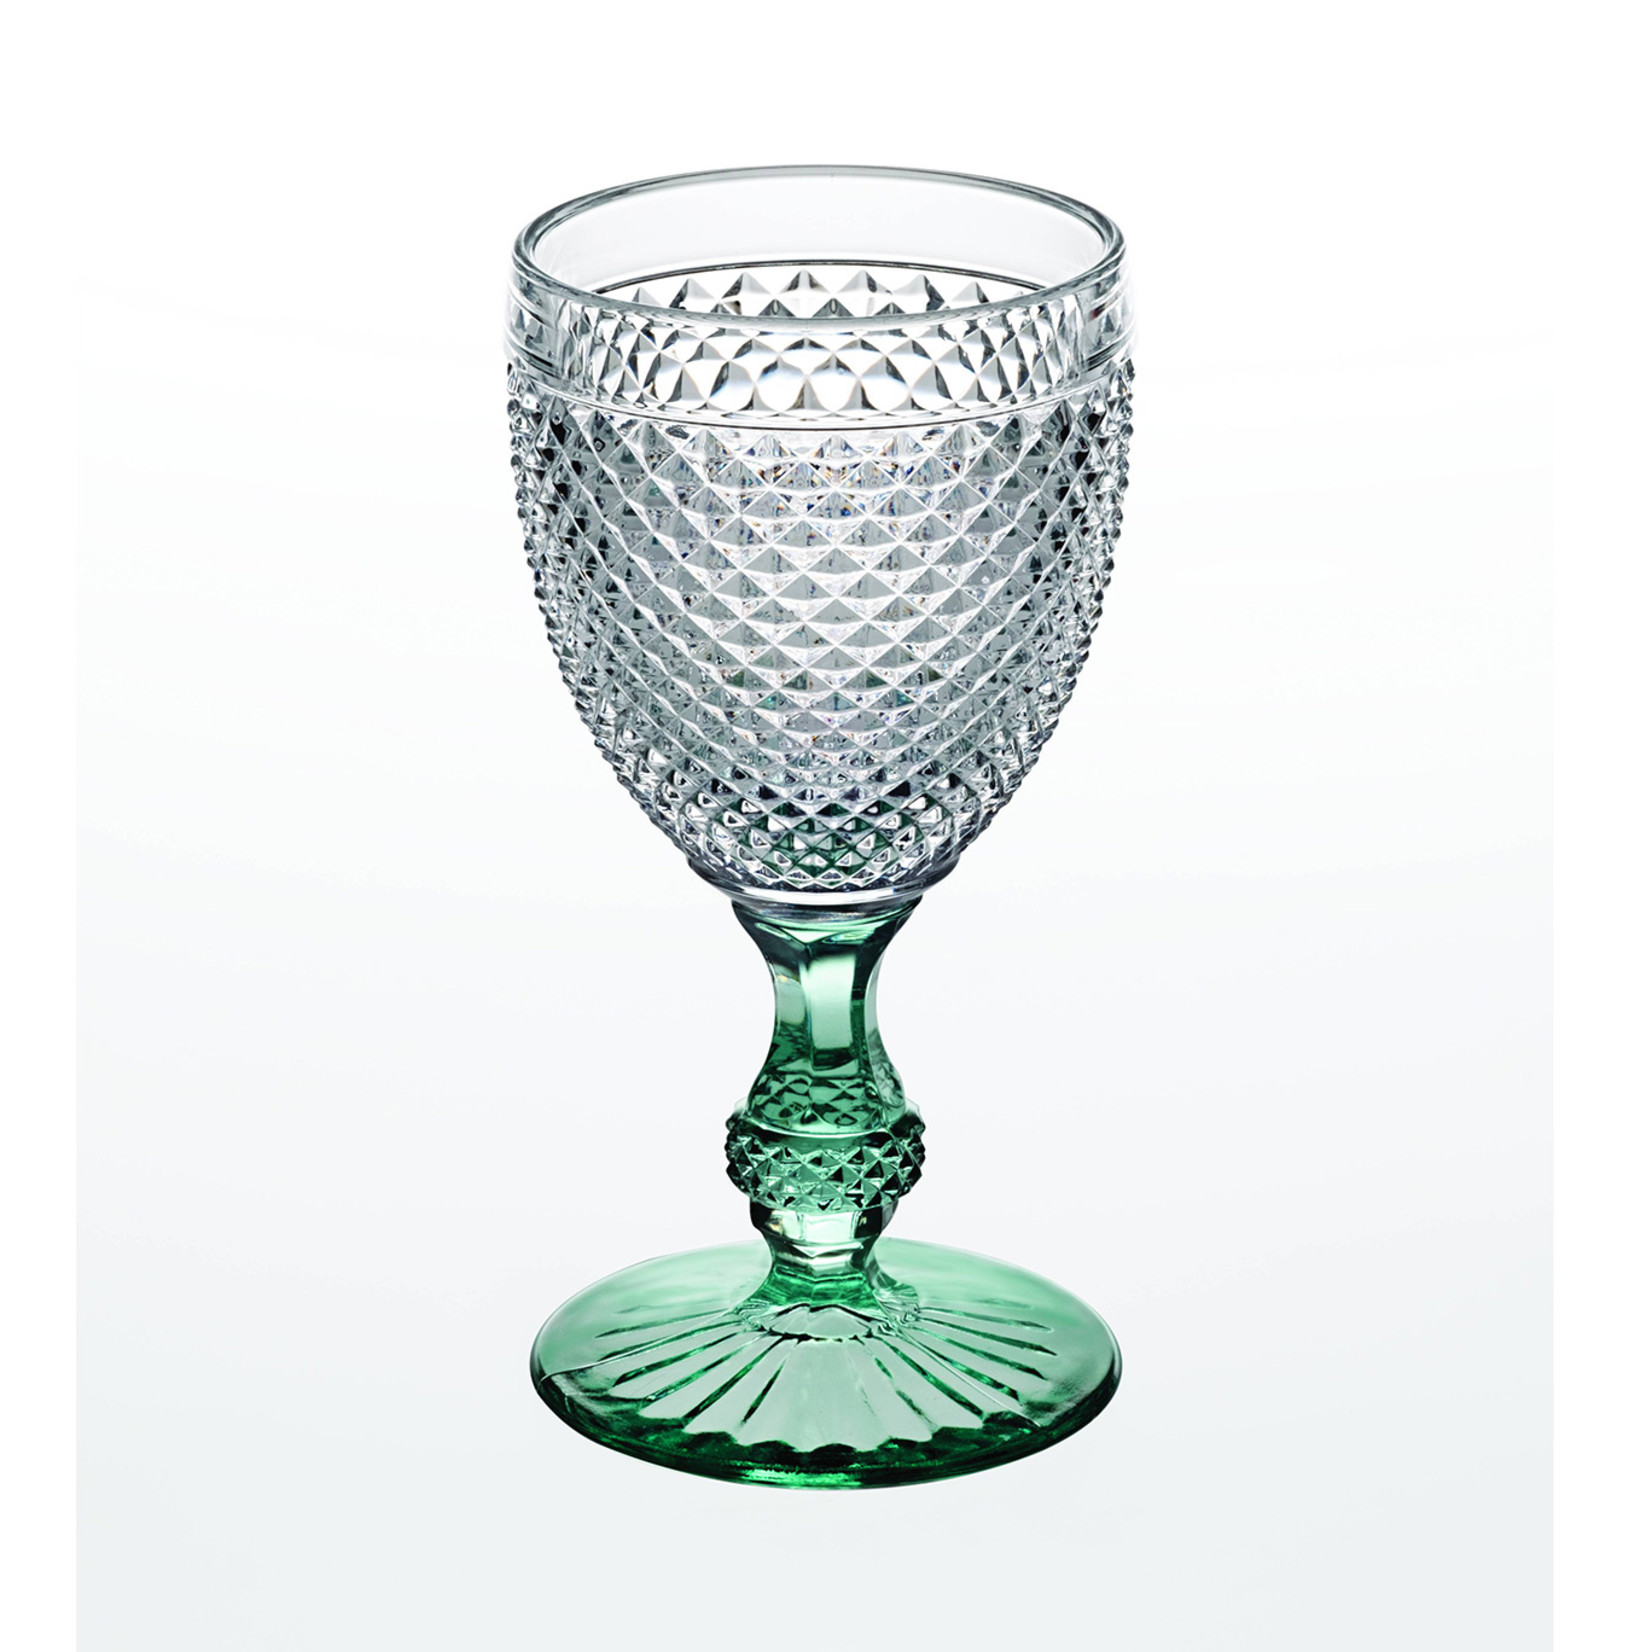 Vista Allegre Bicos Glassware